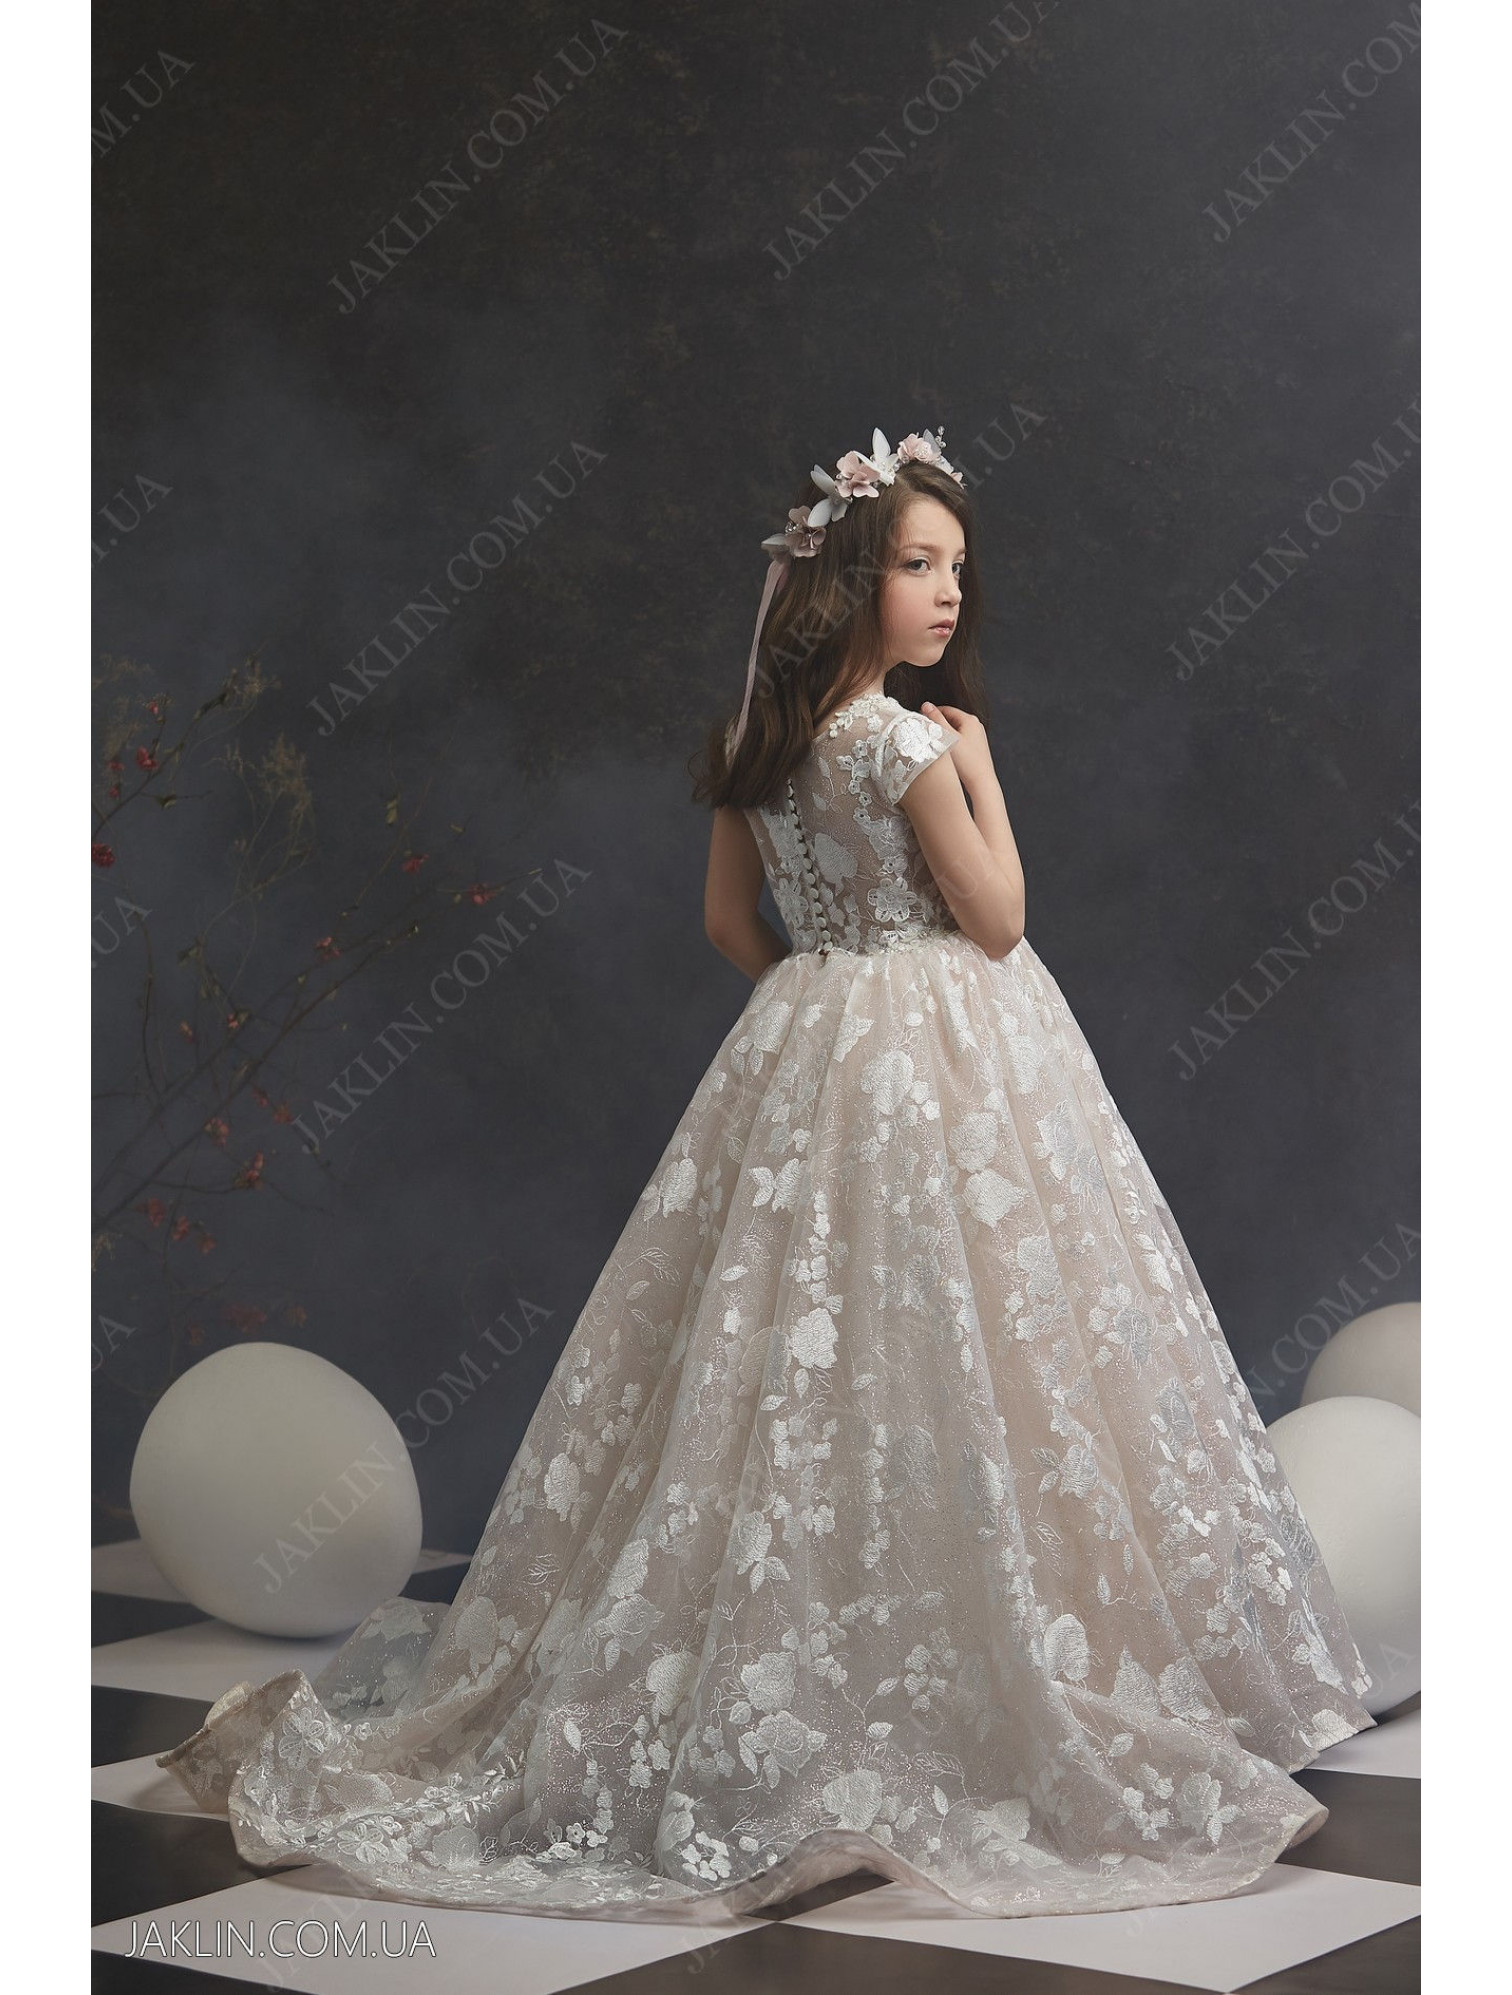 Child dress 3034